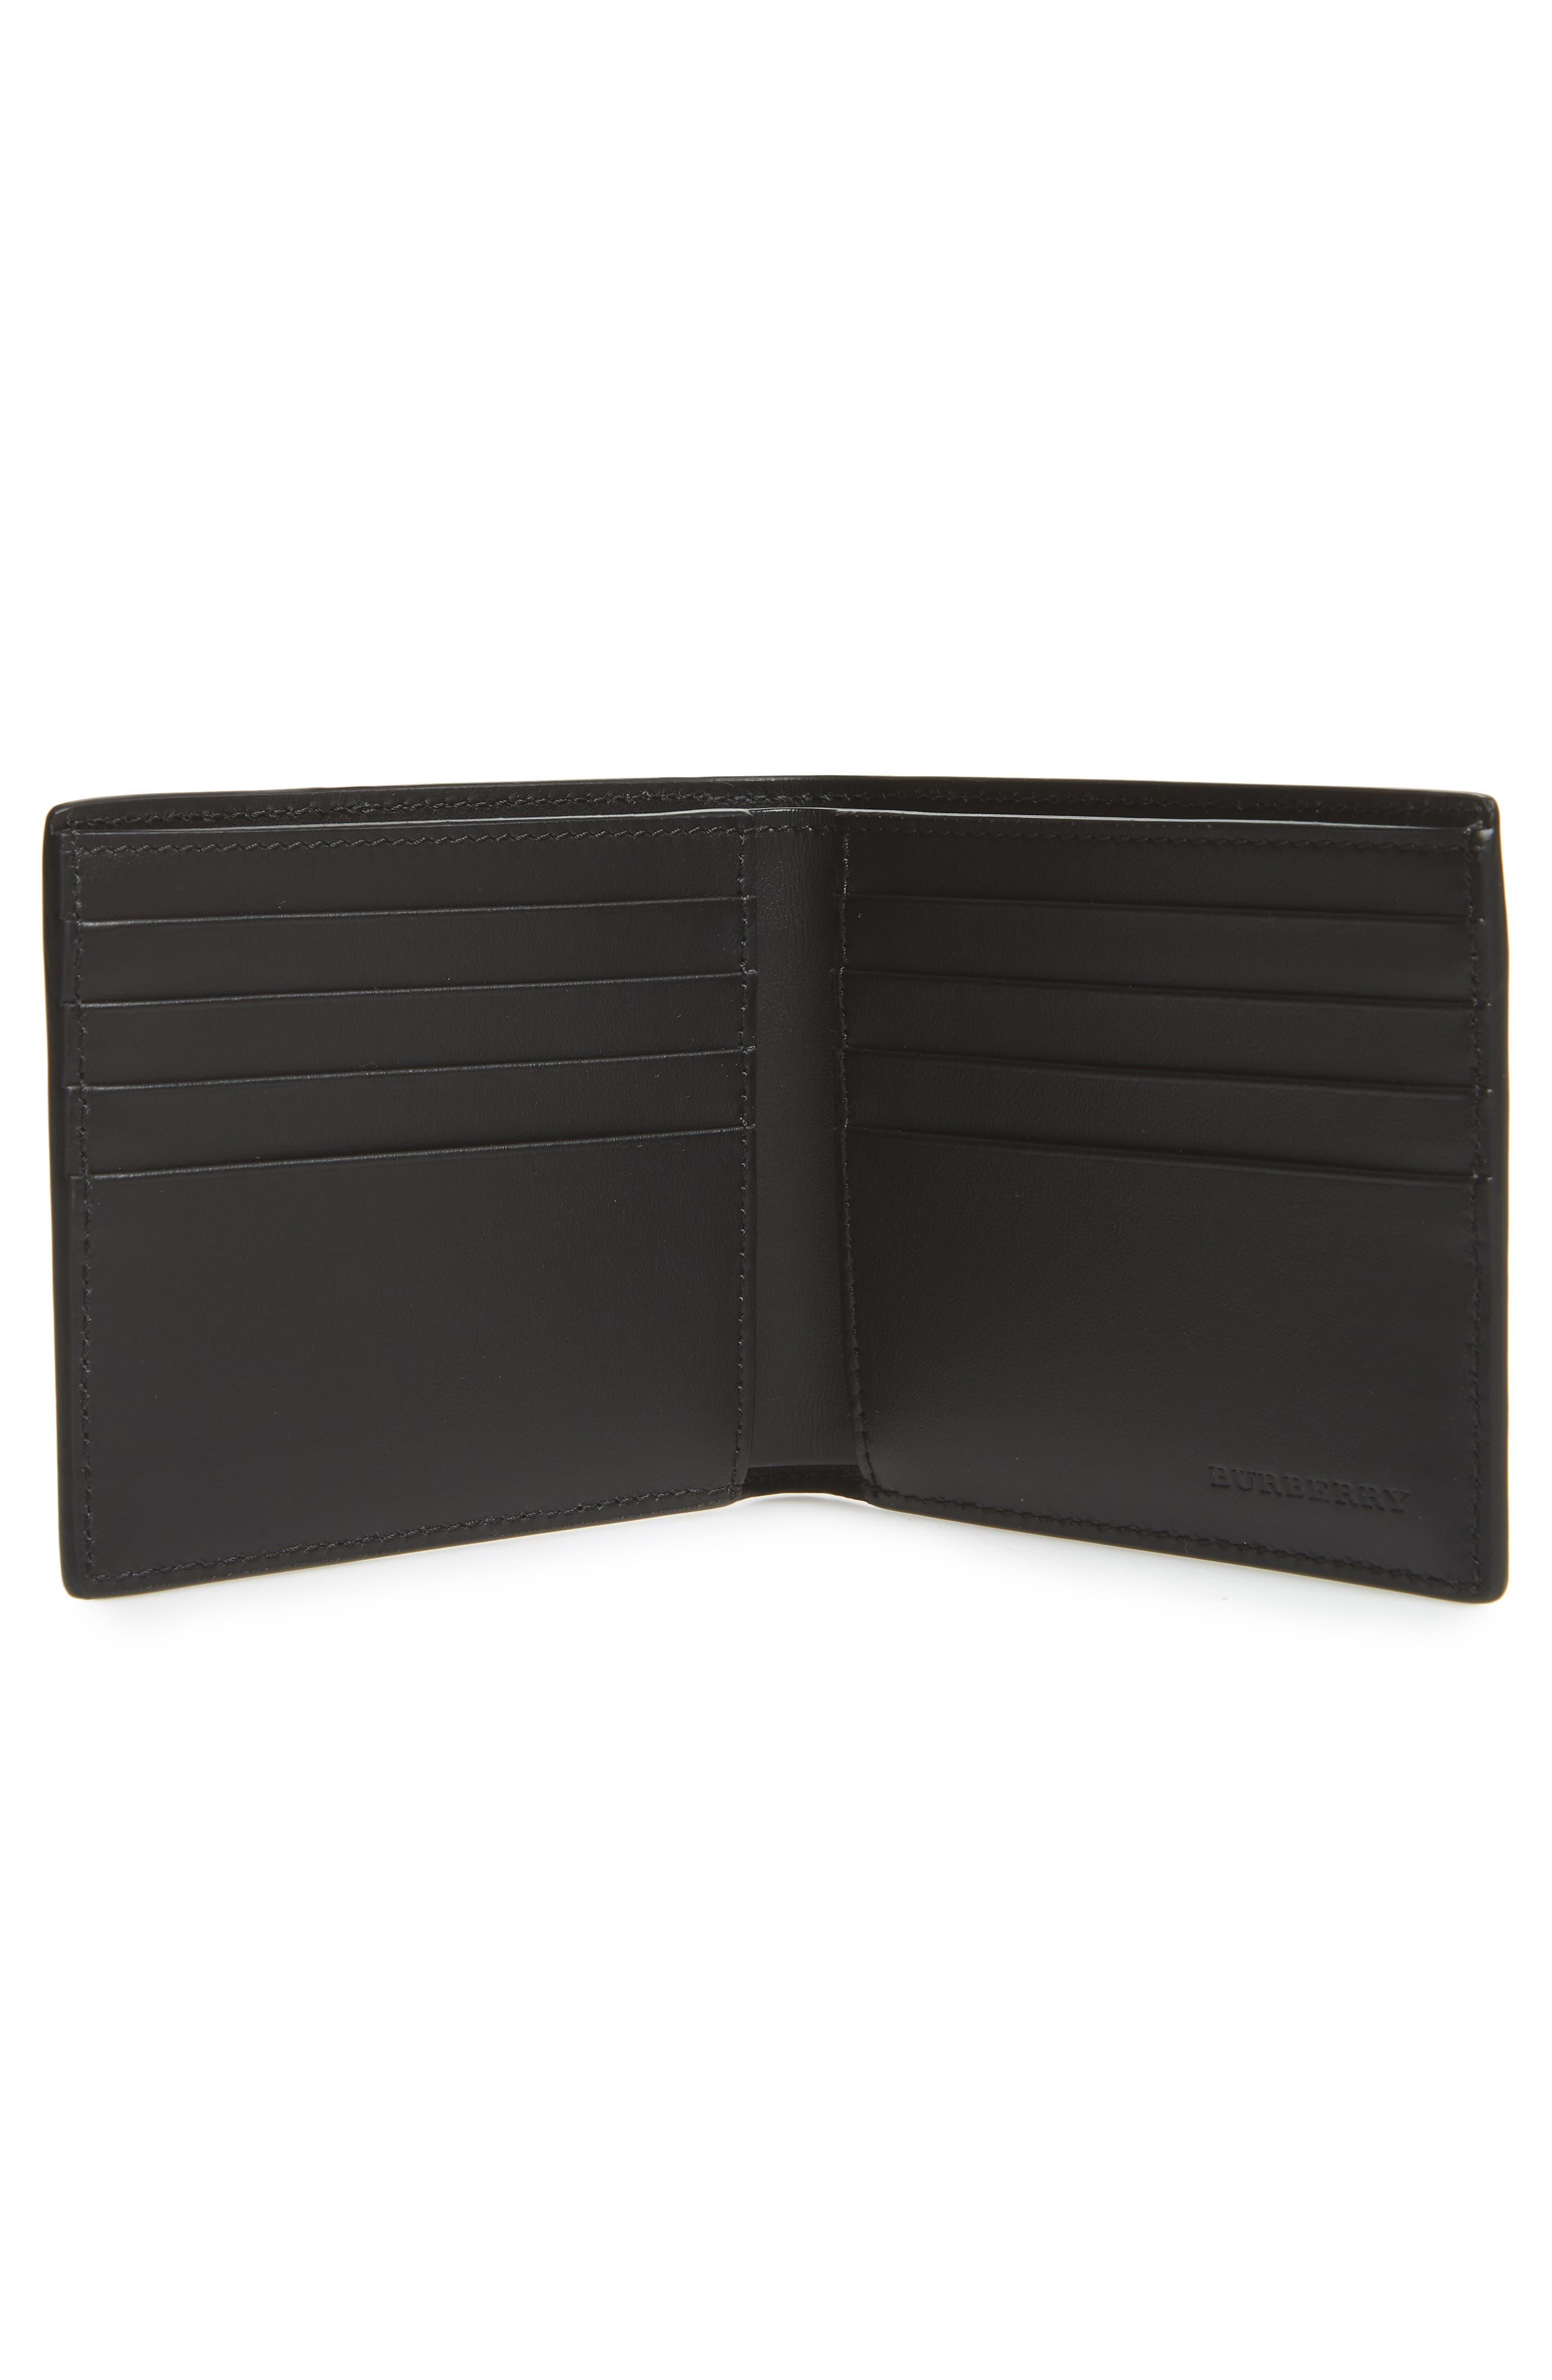 BURBERRY,                             Wallet,                             Alternate thumbnail 2, color,                             ANTIQUE YELLOW/ BLACK